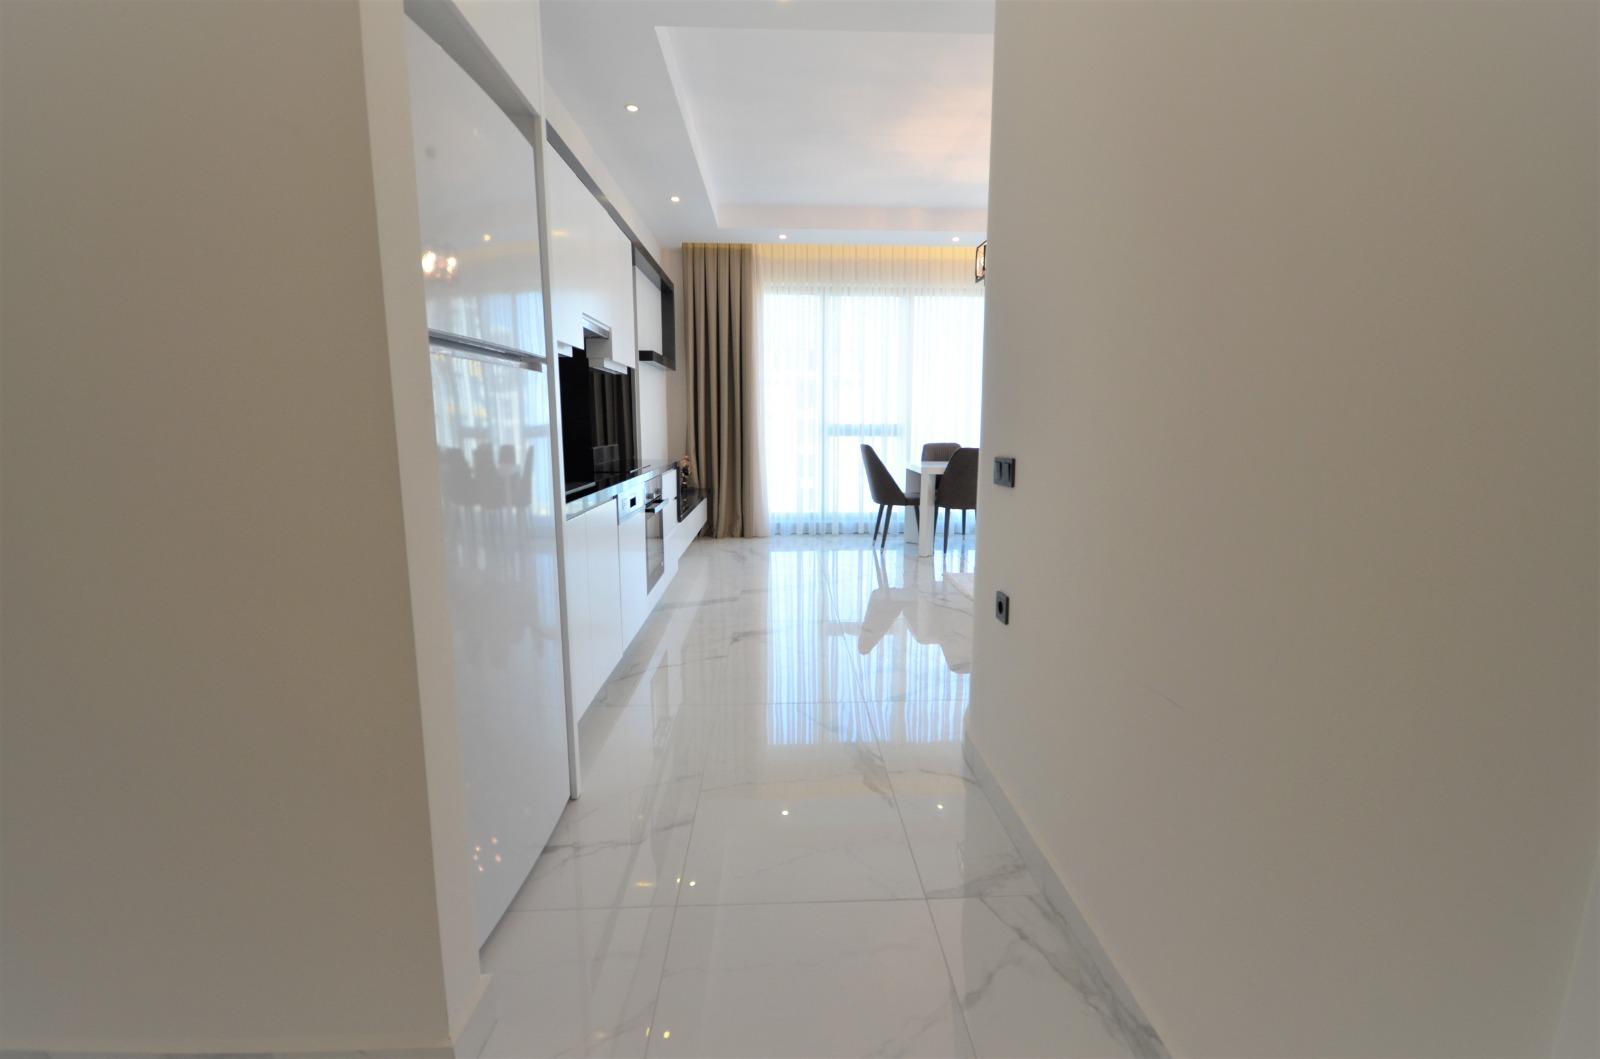 Алания Каргыджак Квартира 2+1 в Строящемся Комплексе Класса Люкс